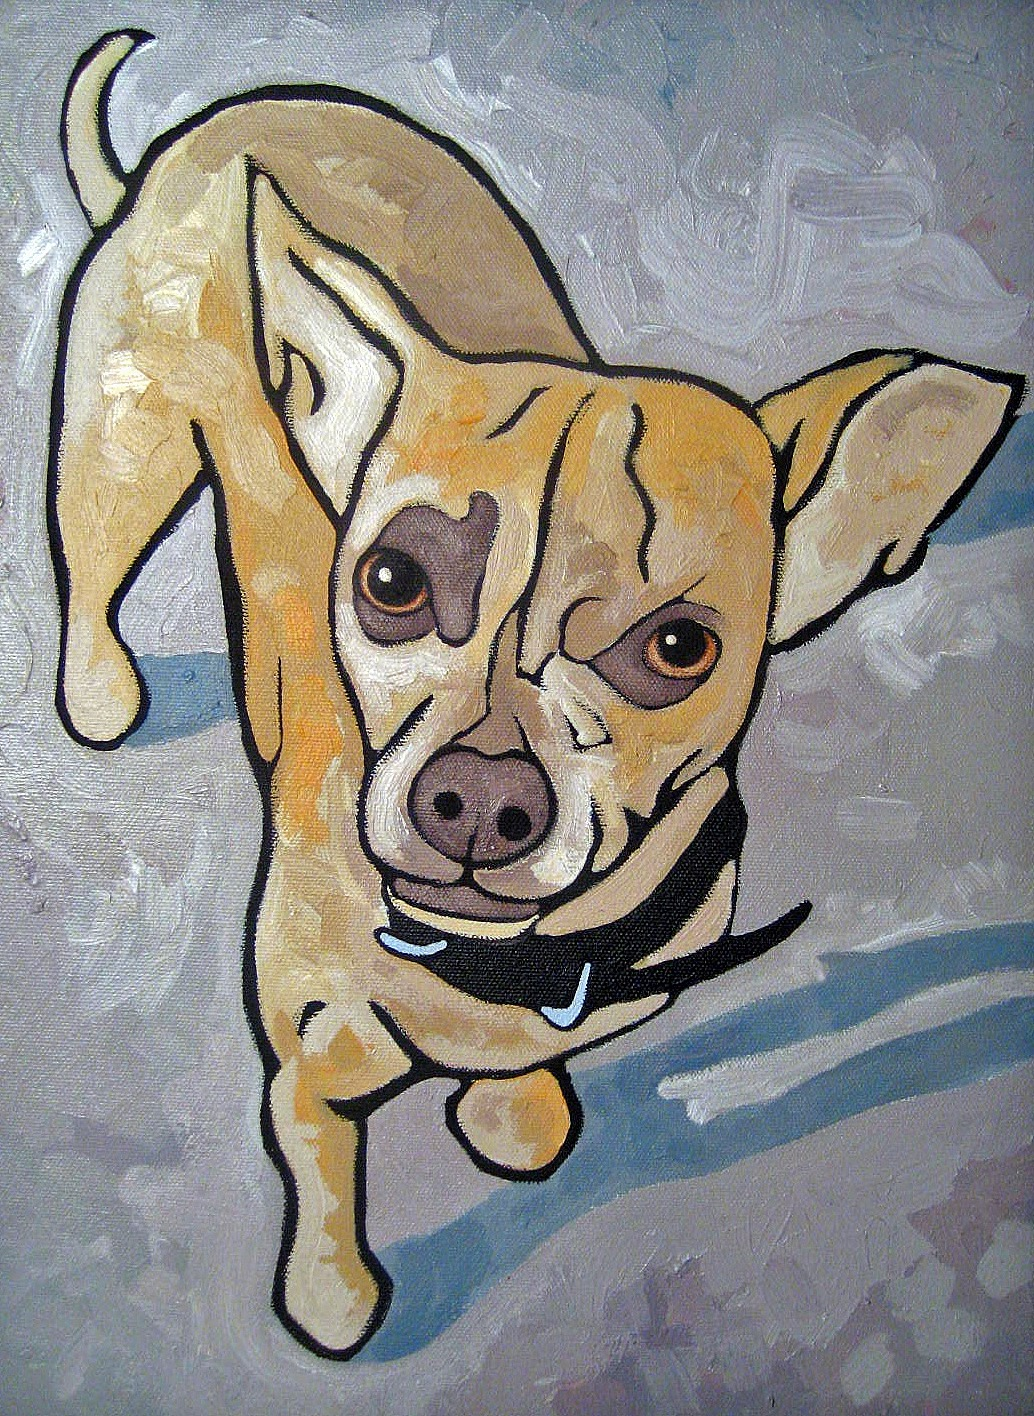 """Gizmo"", mixed media painting"